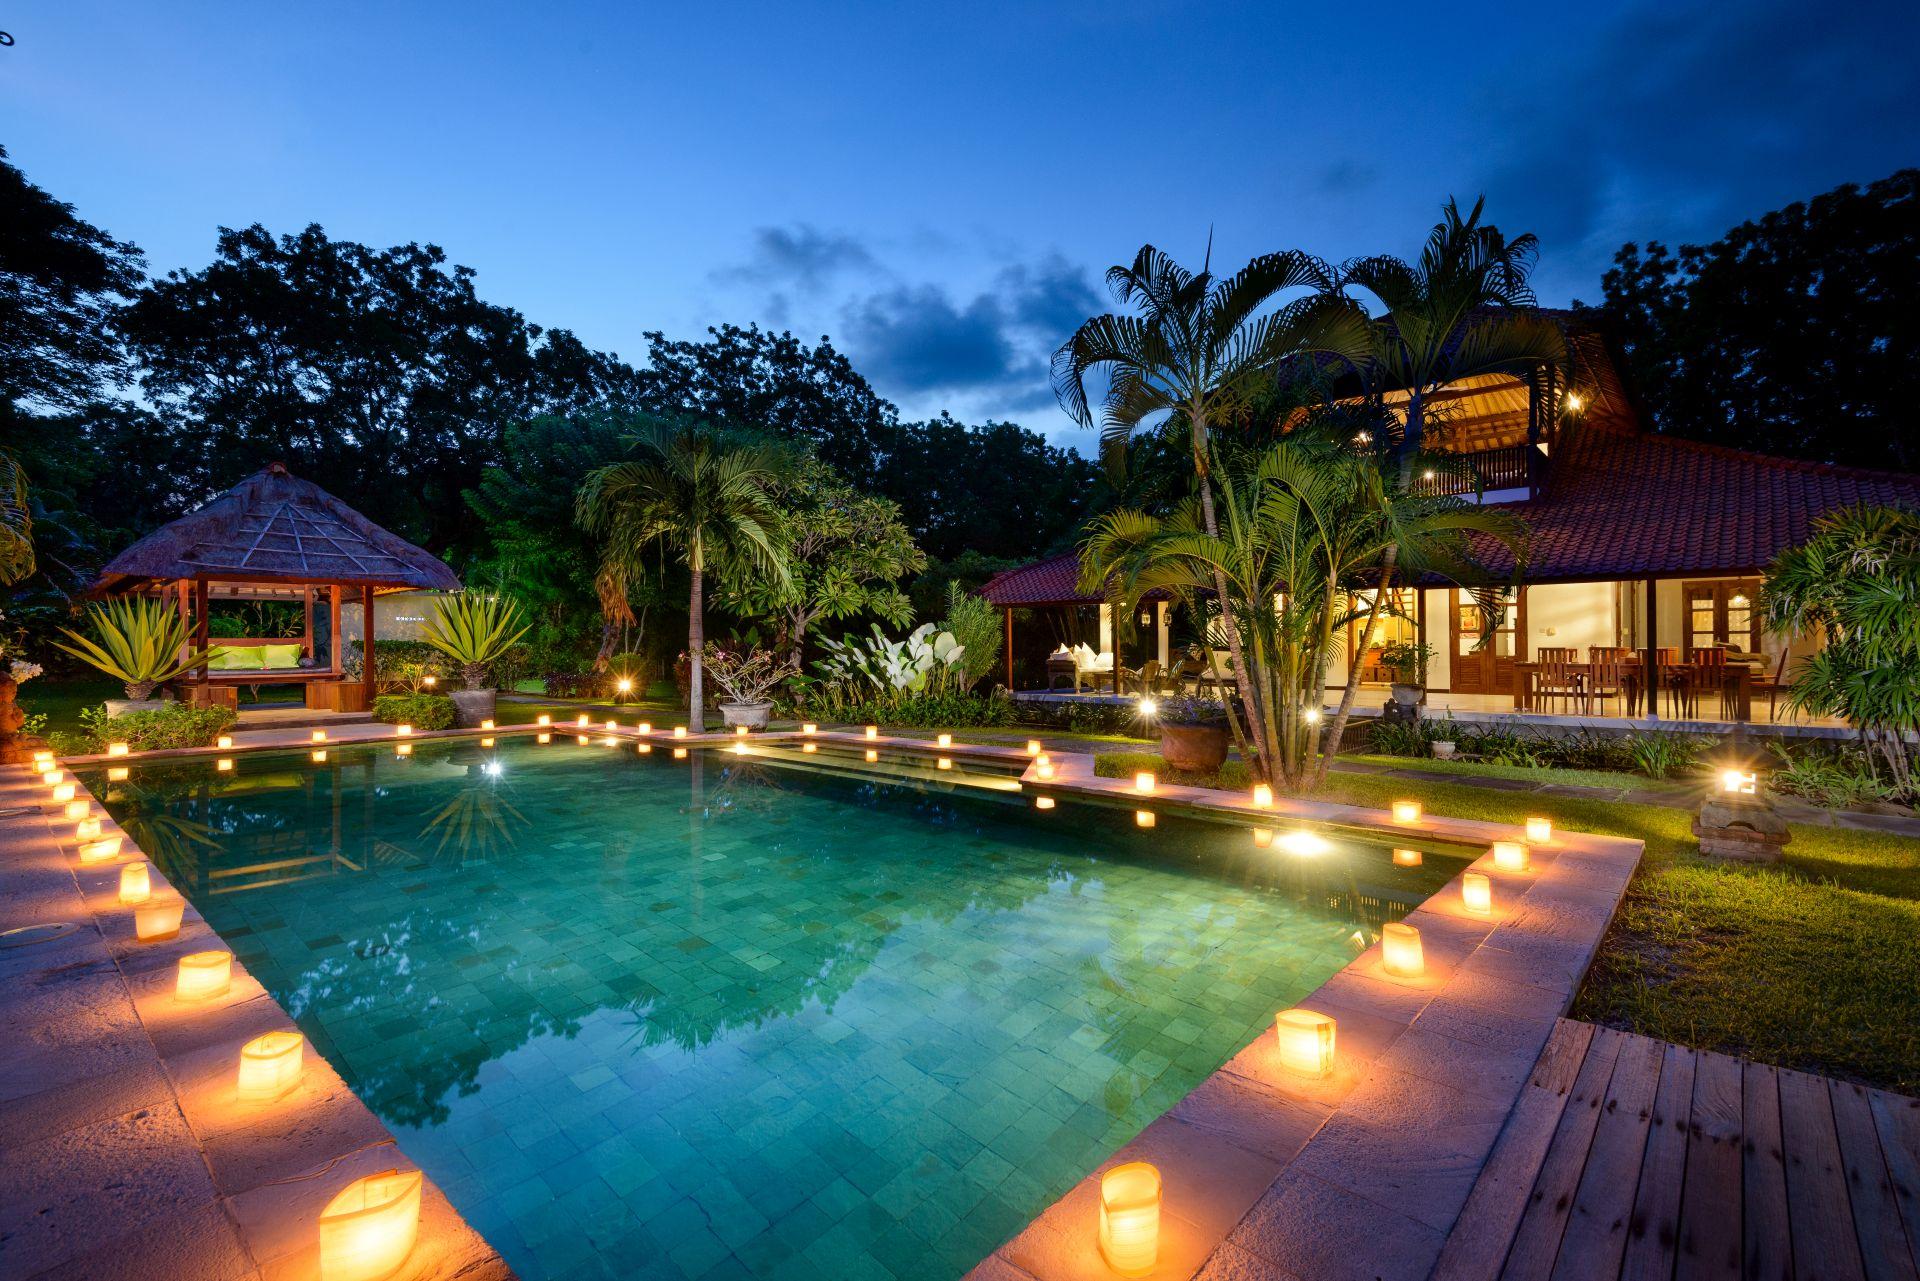 Luze priv zwembad en terras villa bet n bukit for Zwembad prive